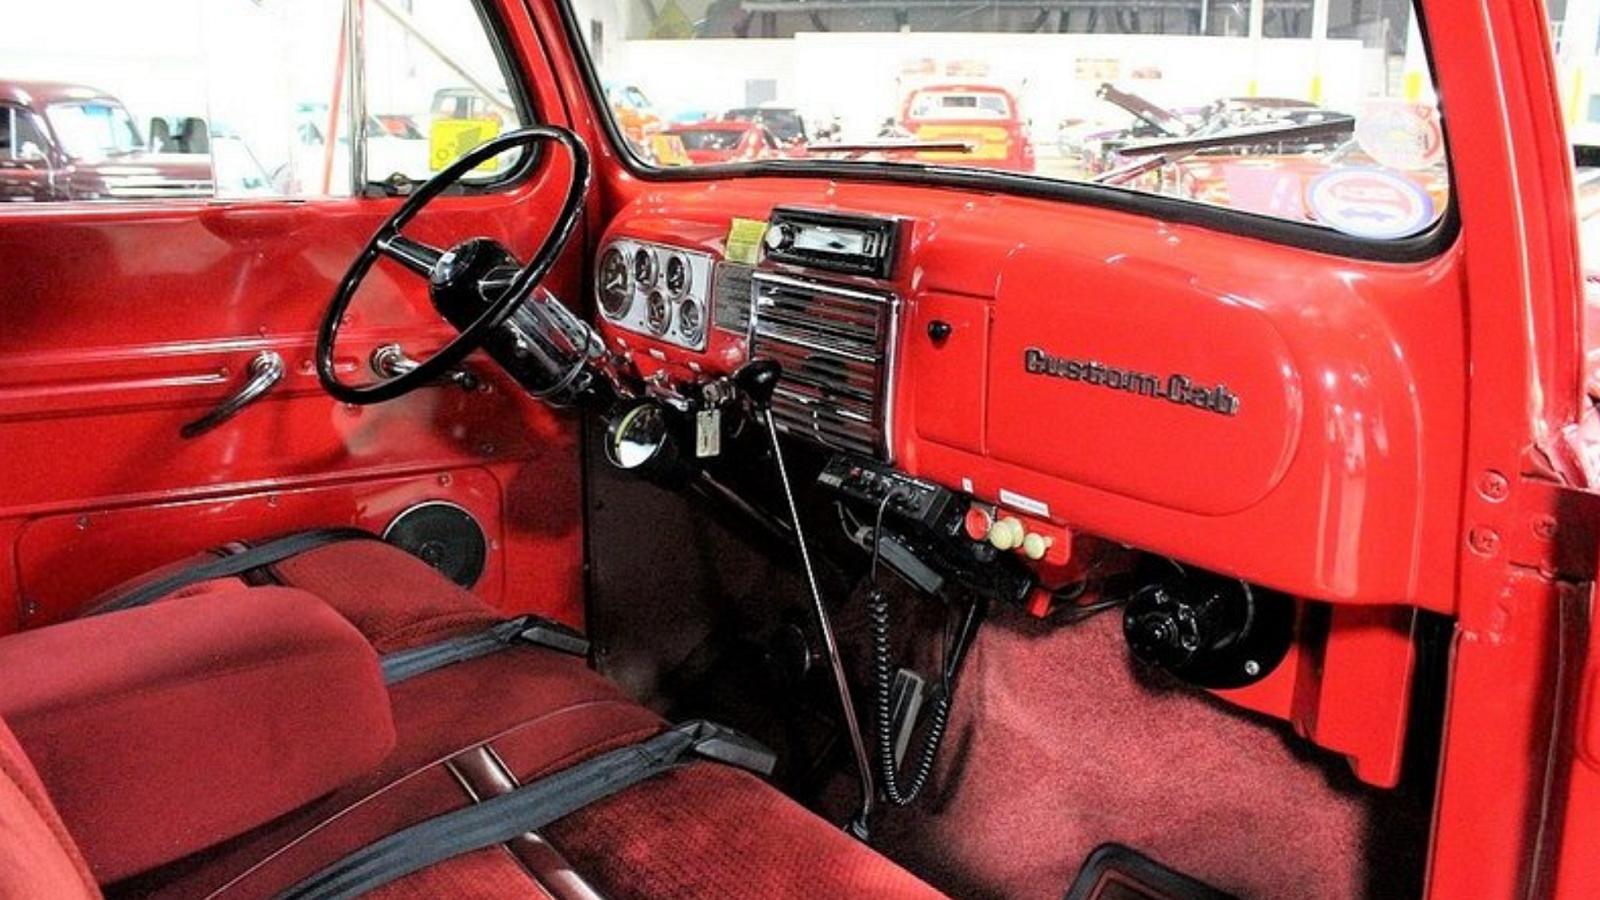 Ford F6: Vintage Alternative to the Average Big Rig